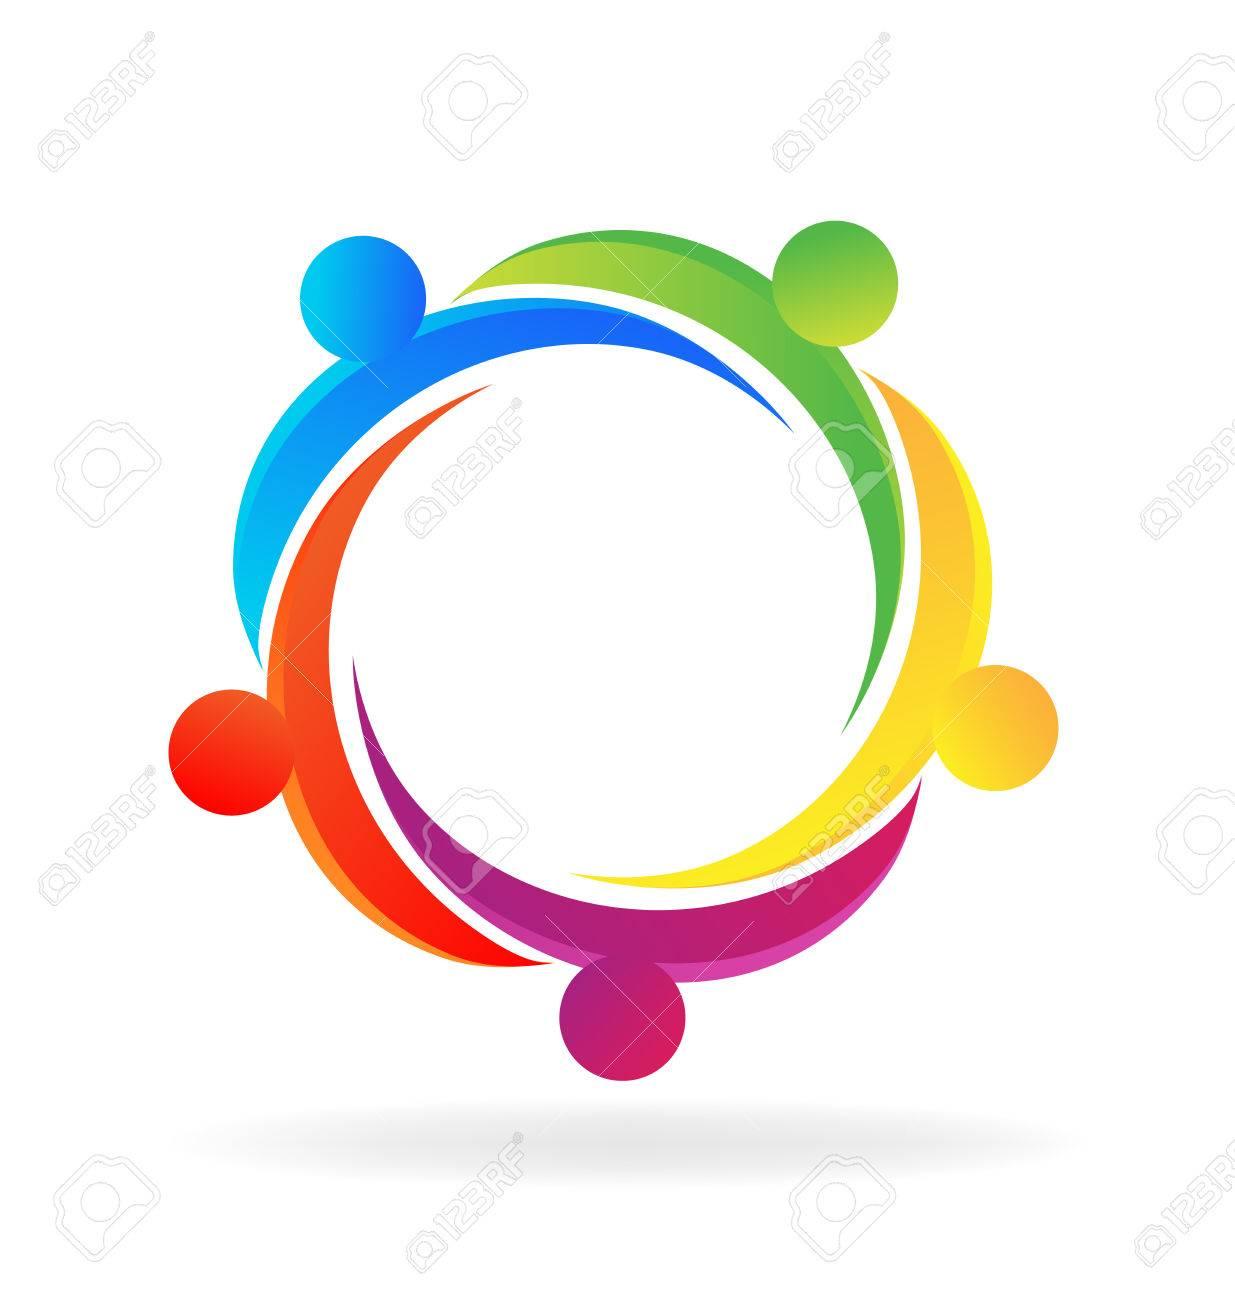 teamwork hug people logo vector concept of unity royalty free rh 123rf com logo vectors free logo vectors free